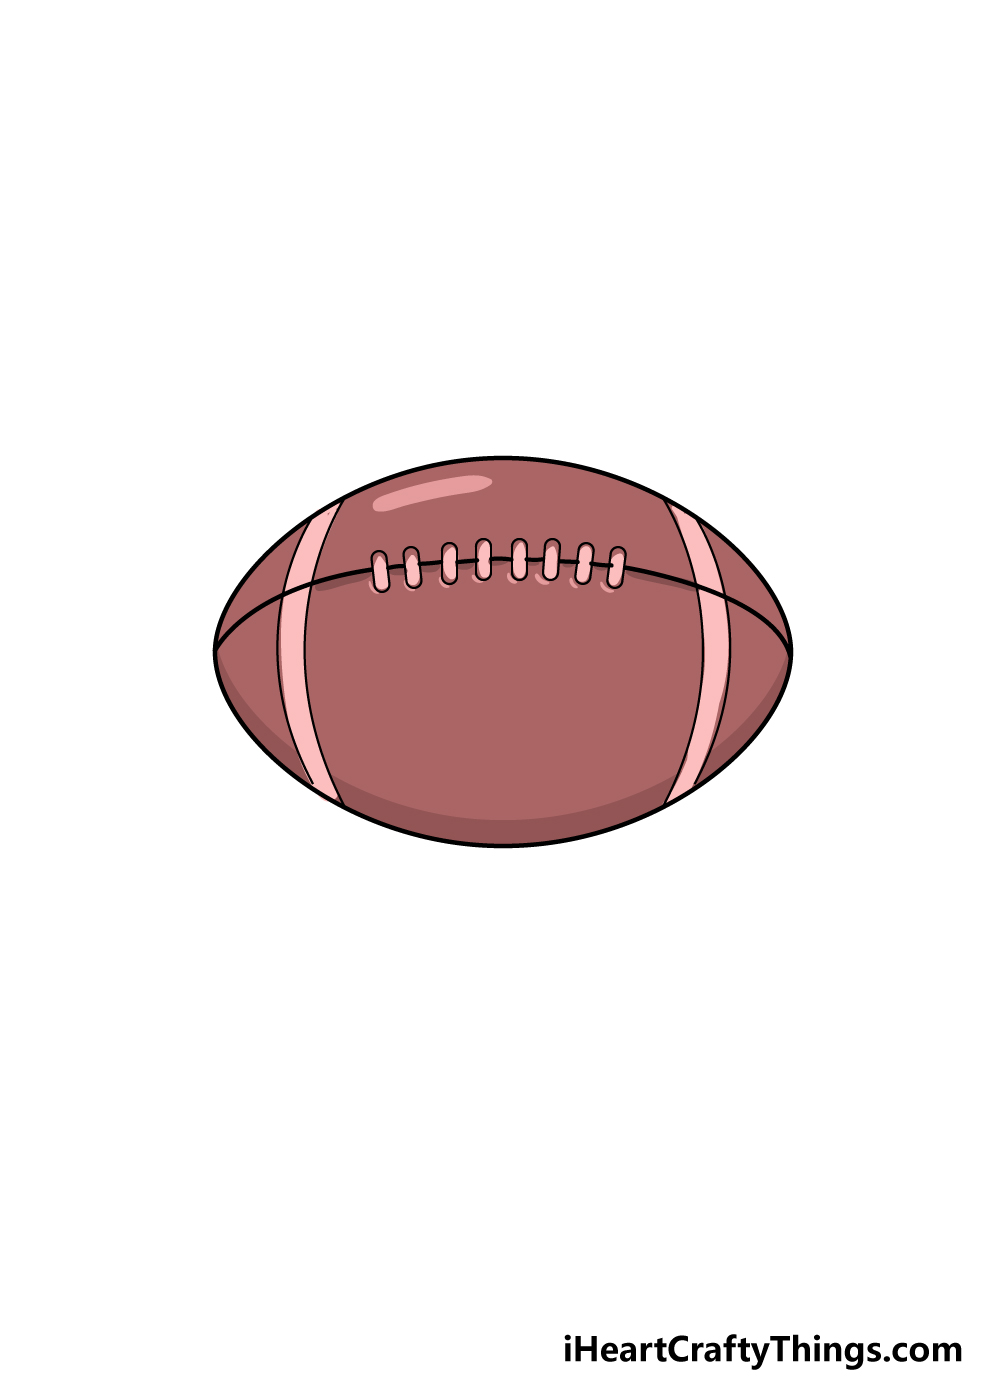 football drawing step 7